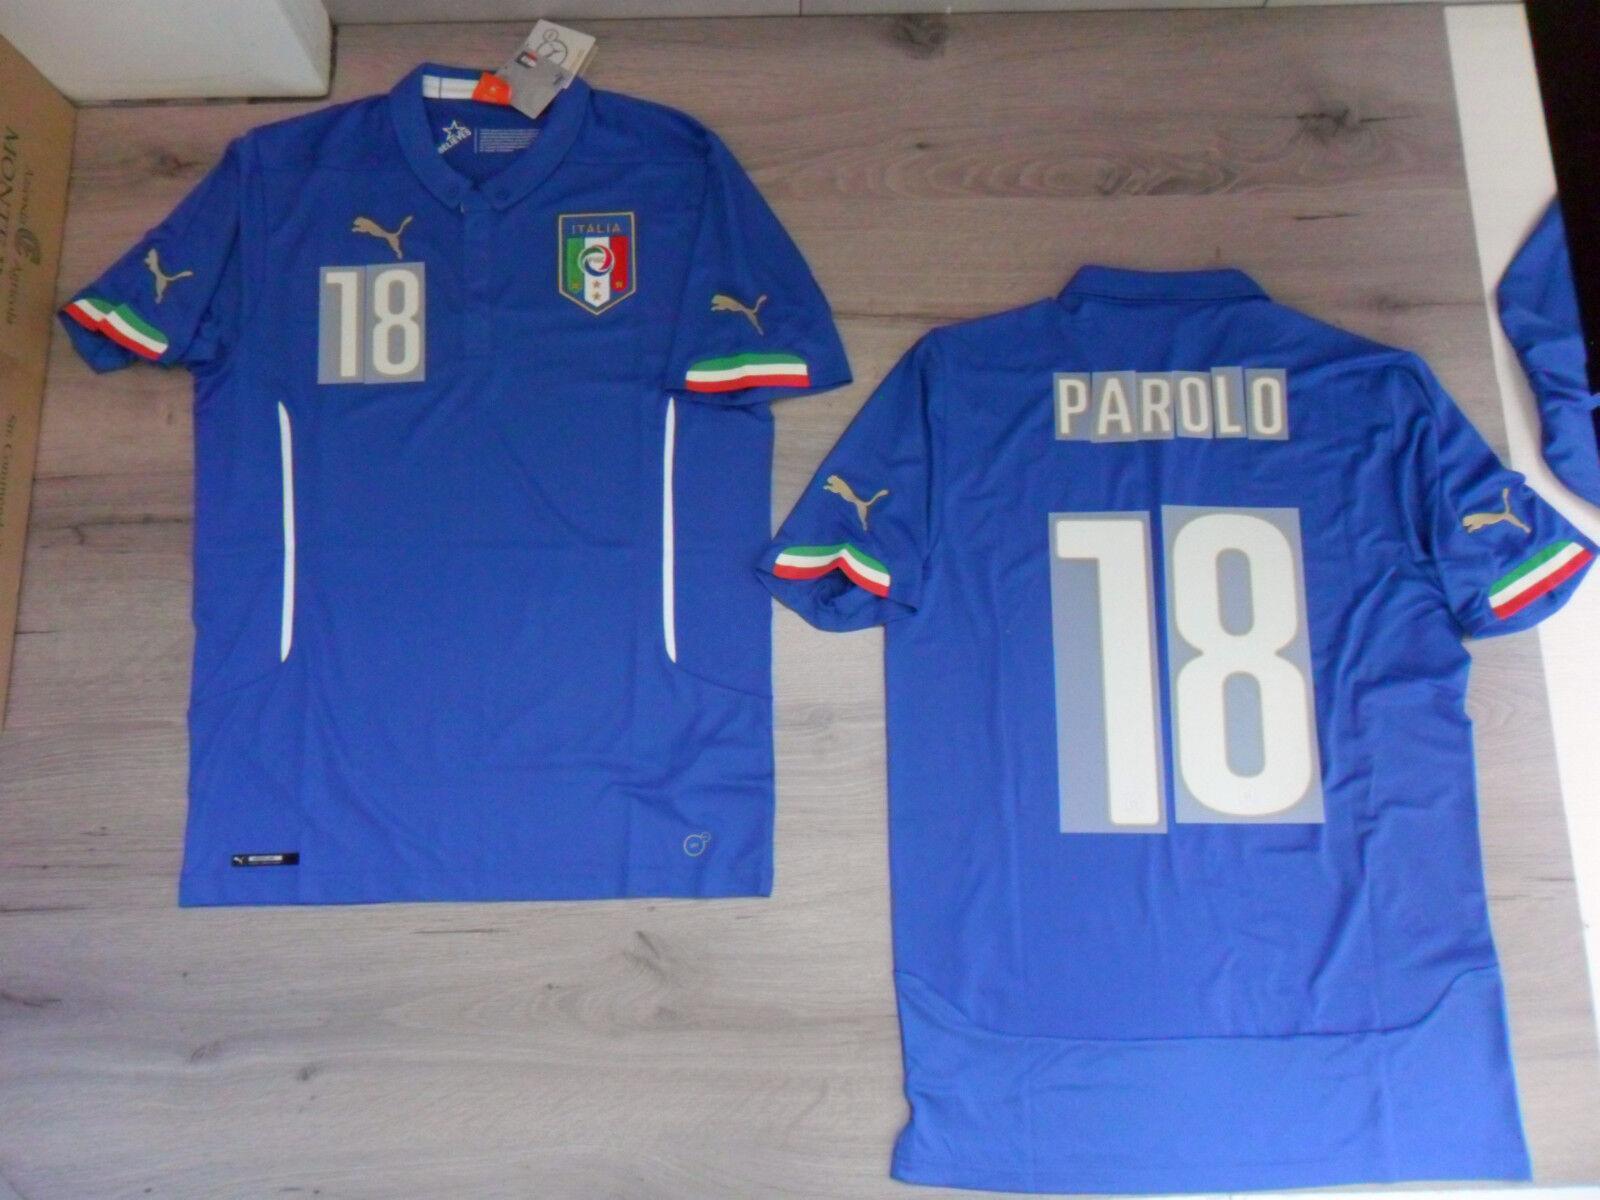 FW14 PUMA S HOME ITALIA 18 PAROLO CAMISETA MUNDIALES SHIRT JERSEY